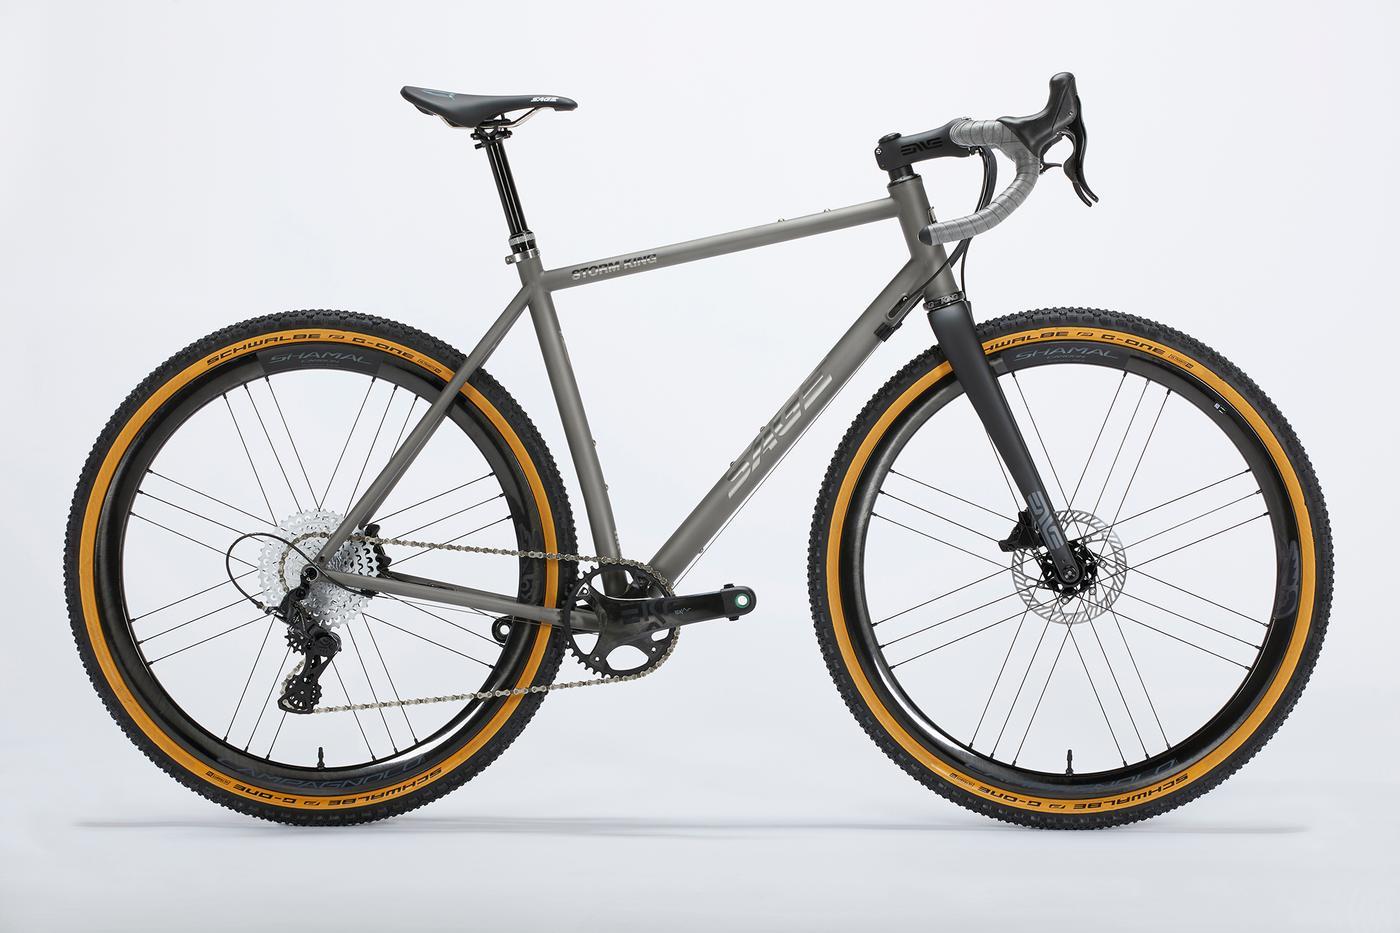 Sage Titanium offers Campagnolo Ekar 13-Speed on their Gravel Bikes